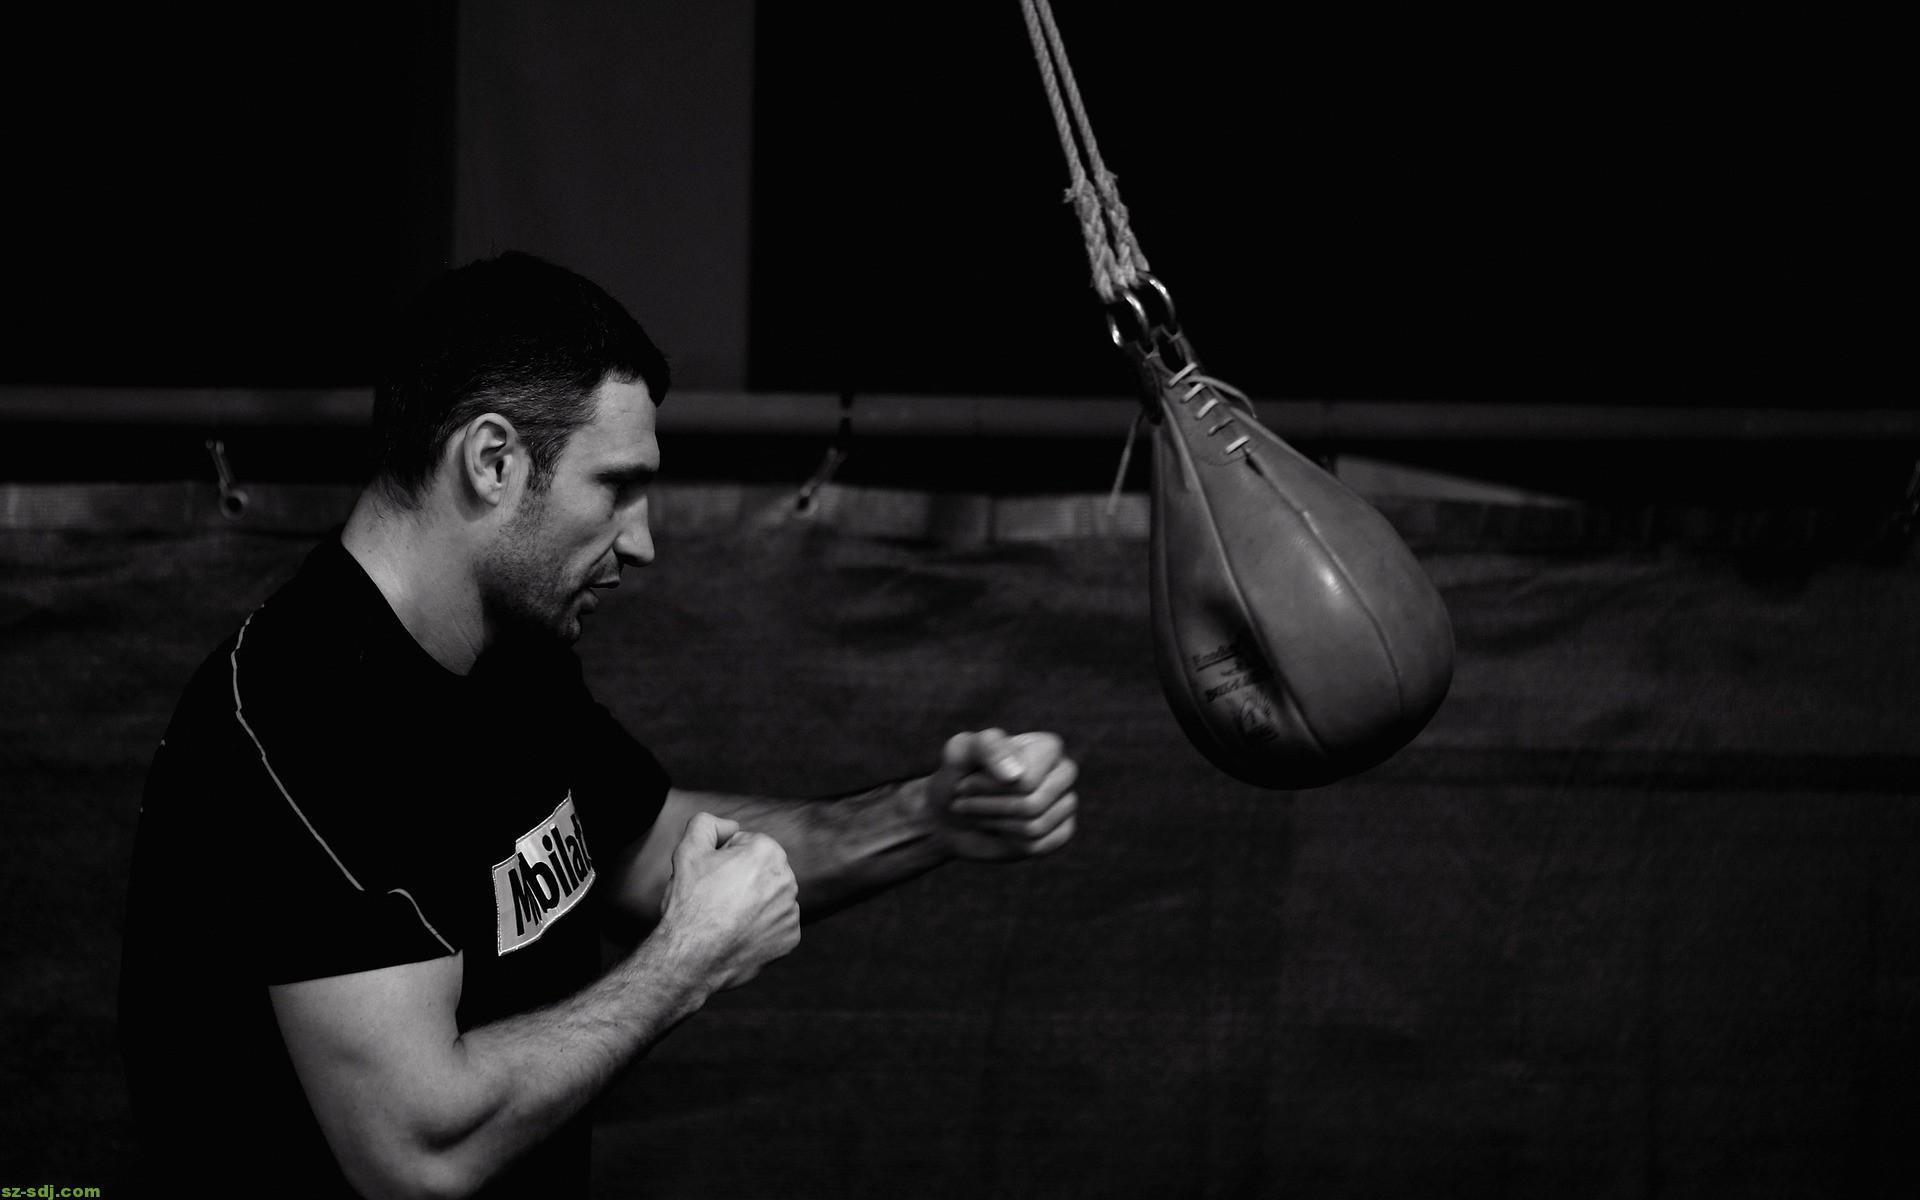 Boxing gloves wallpapers – Boxing gloves wallpaper hd – Boxing .